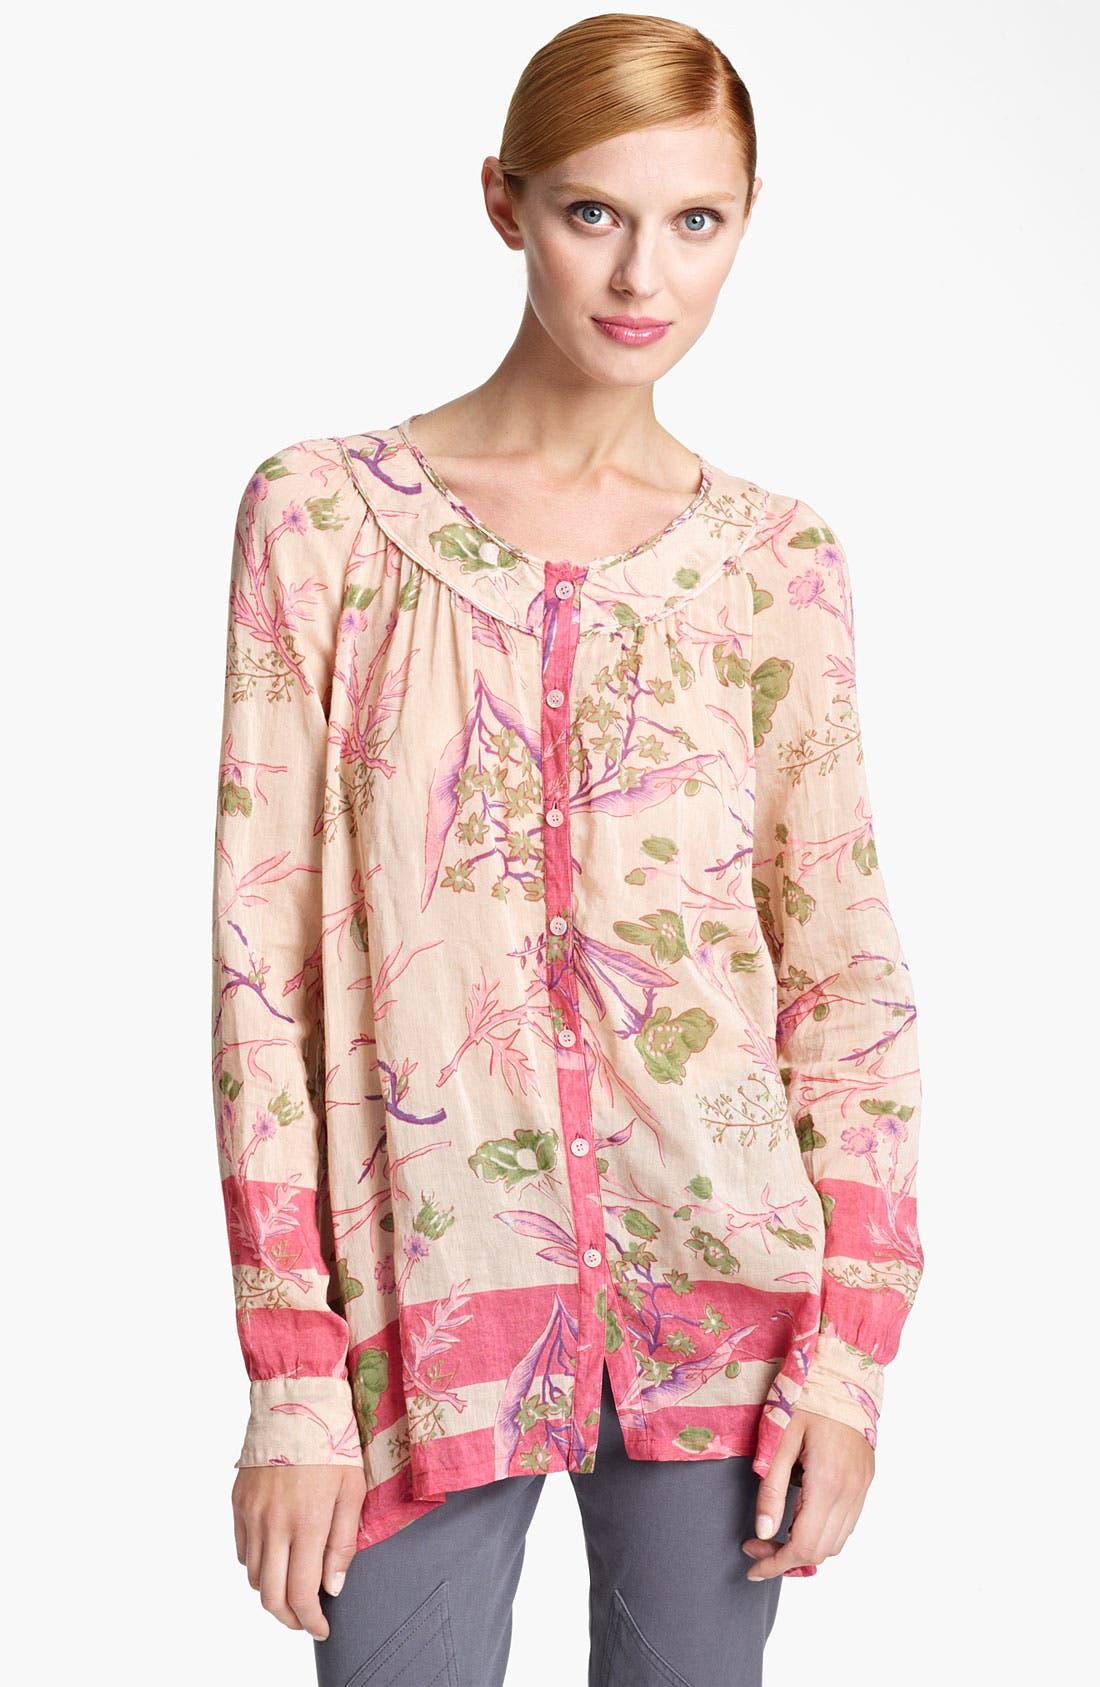 Alternate Image 1 Selected - Donna Karan Collection Floral Print Blouse